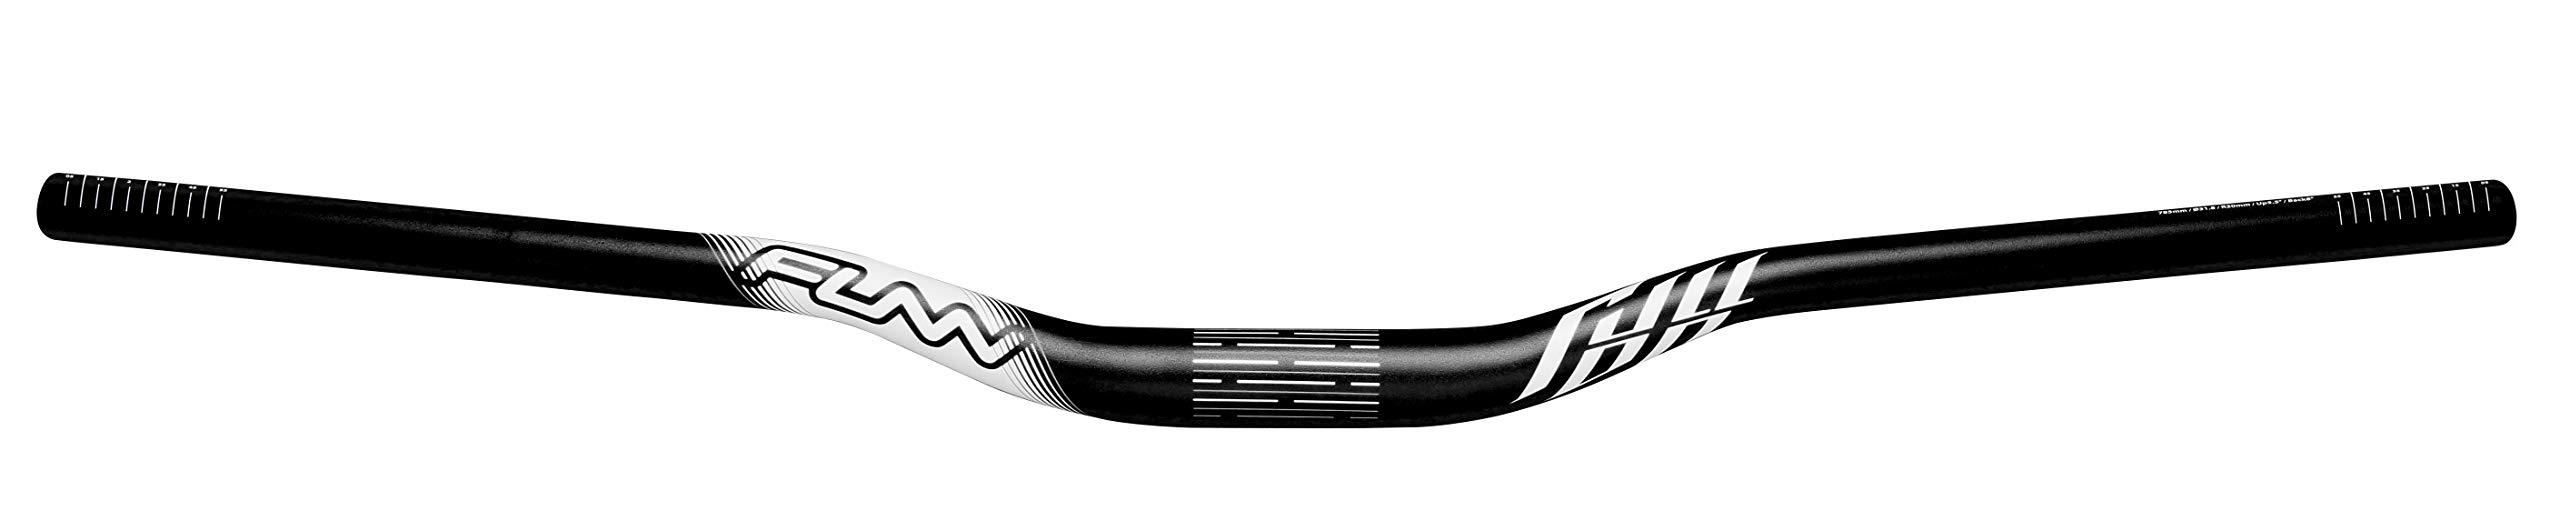 Full On MTB Handlebar, Bar Clamp 31.8mm, Width 785mm (Rise 30mm, Black) by Funn